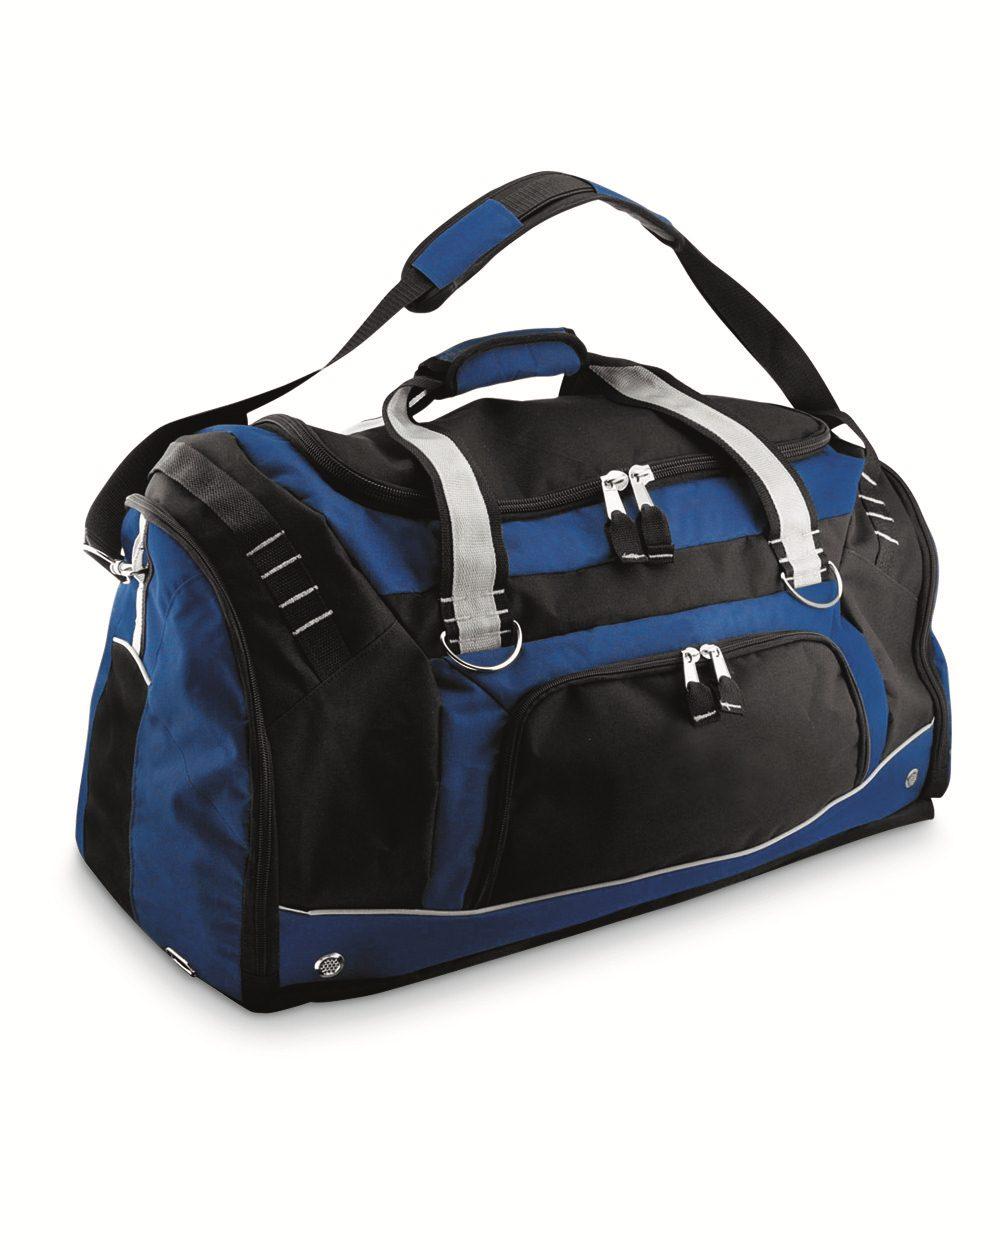 Valubag 25 Inch Sports Duffel Bag - VB0917